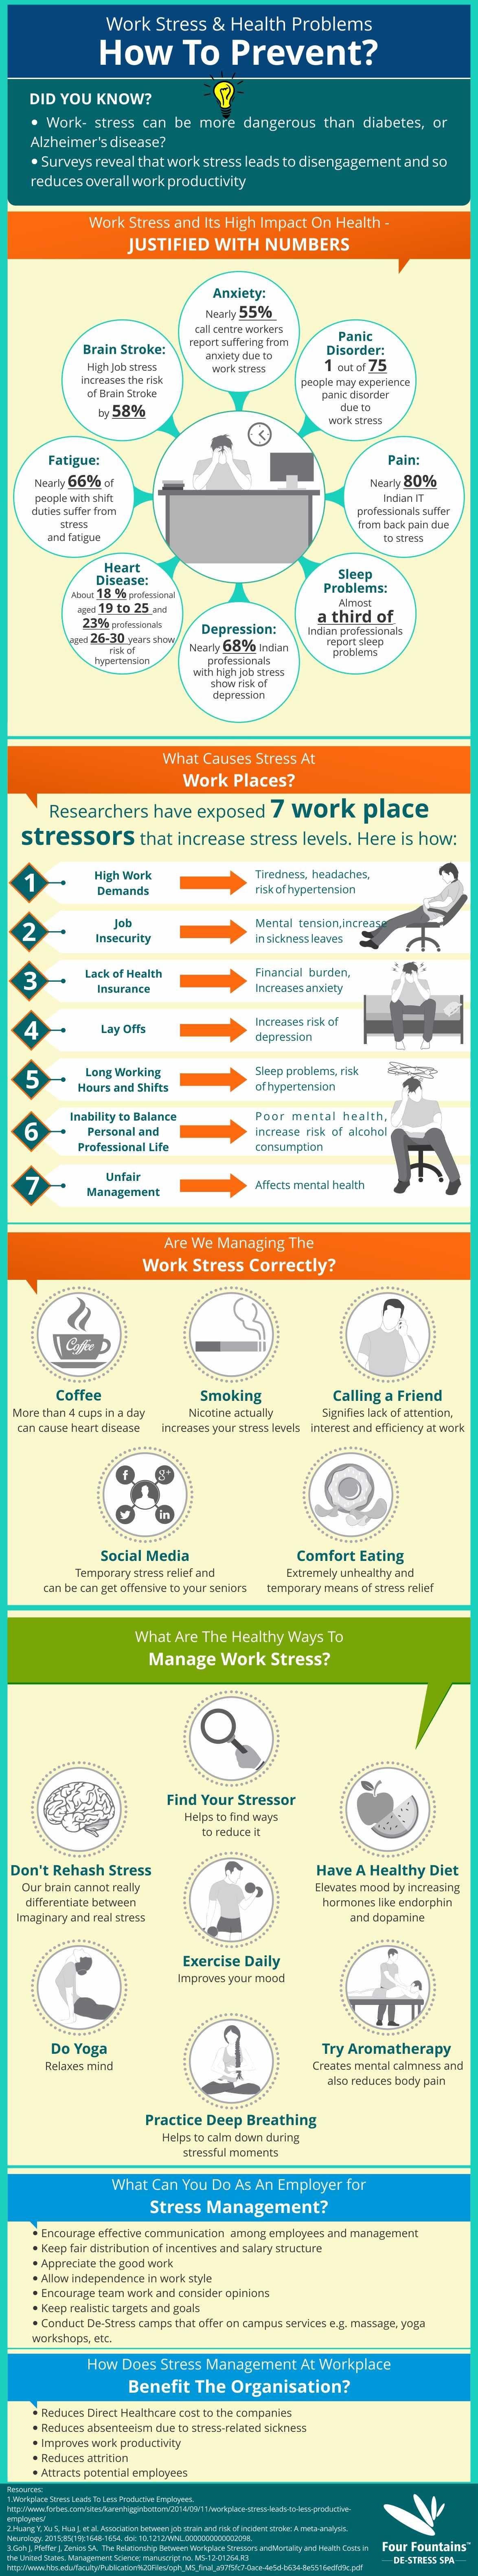 Work Stress & Health Problems